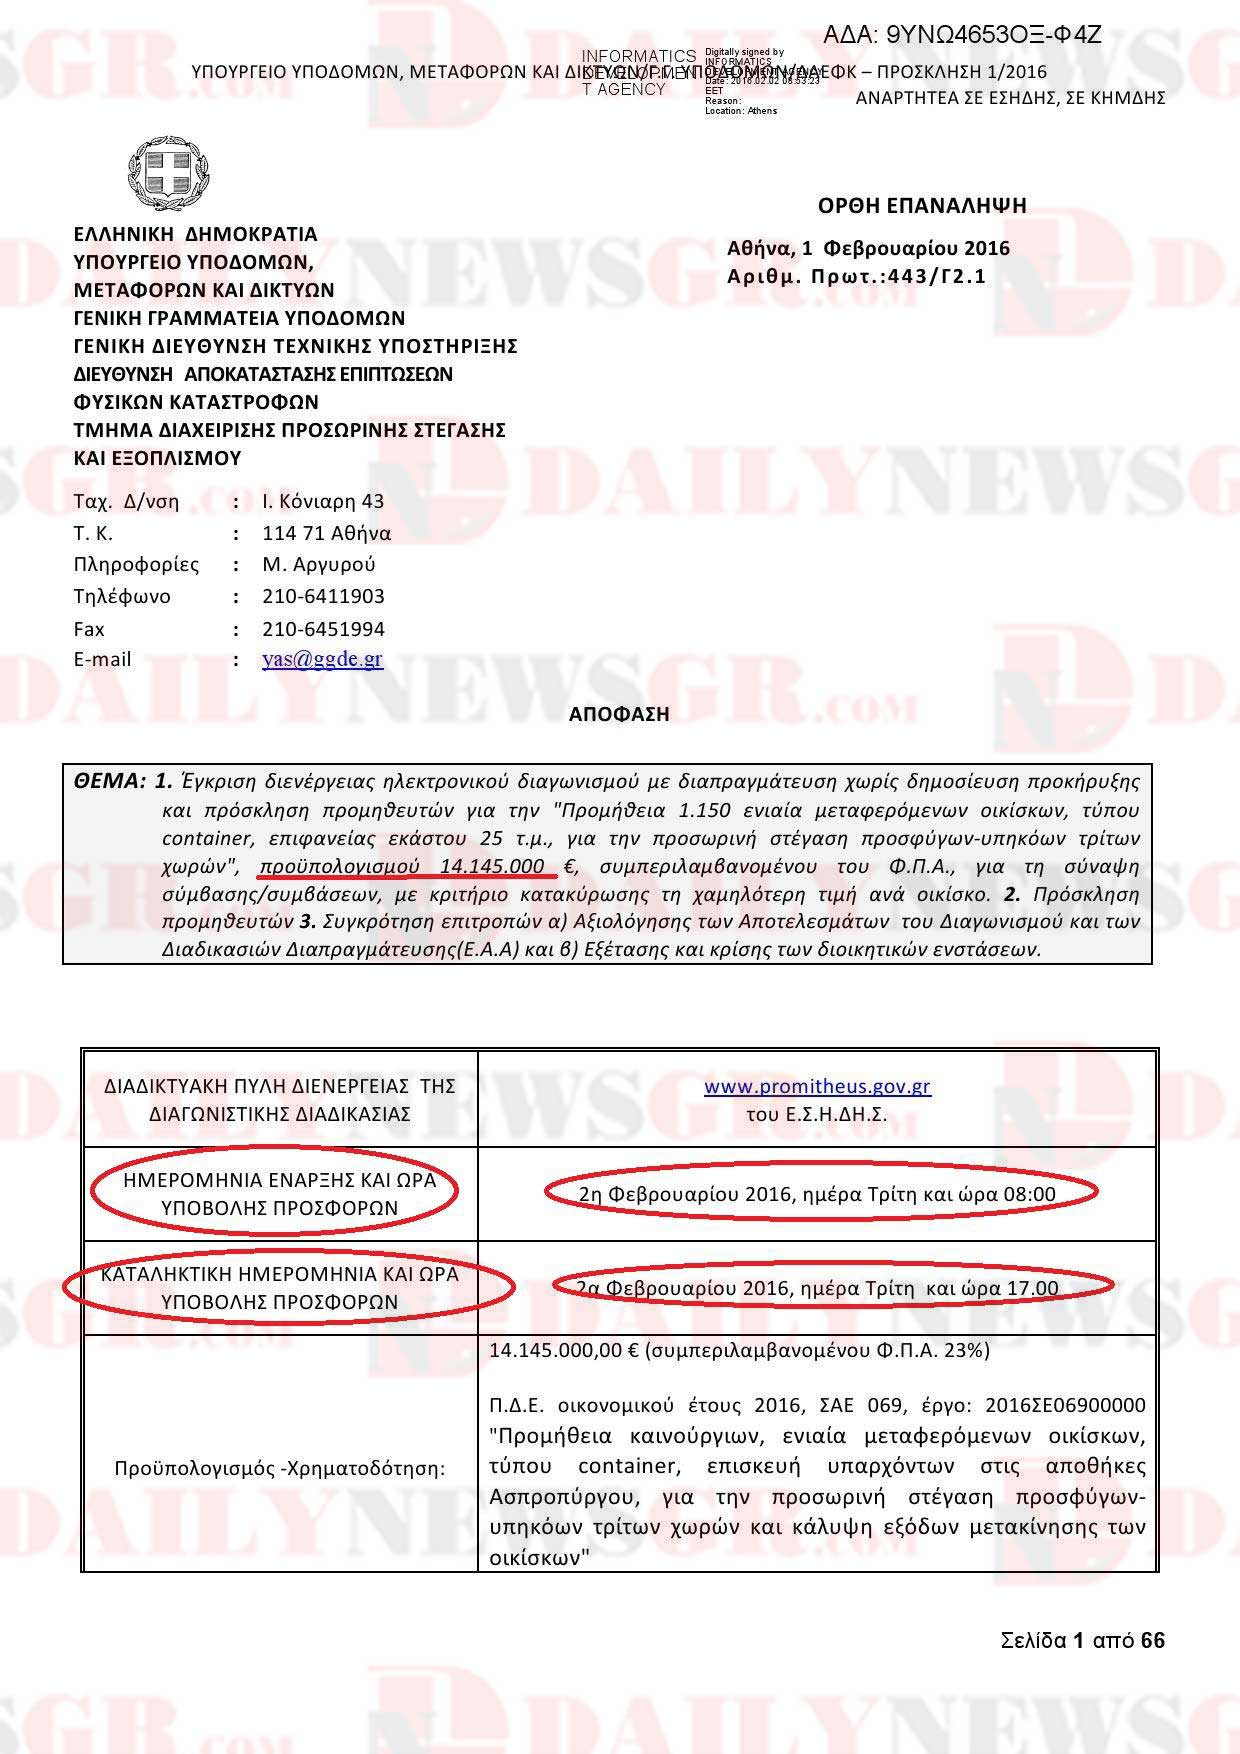 diagonismos syriza hot spot lathrometanastes panos leliatsos daily news gr 05 02 2016 02